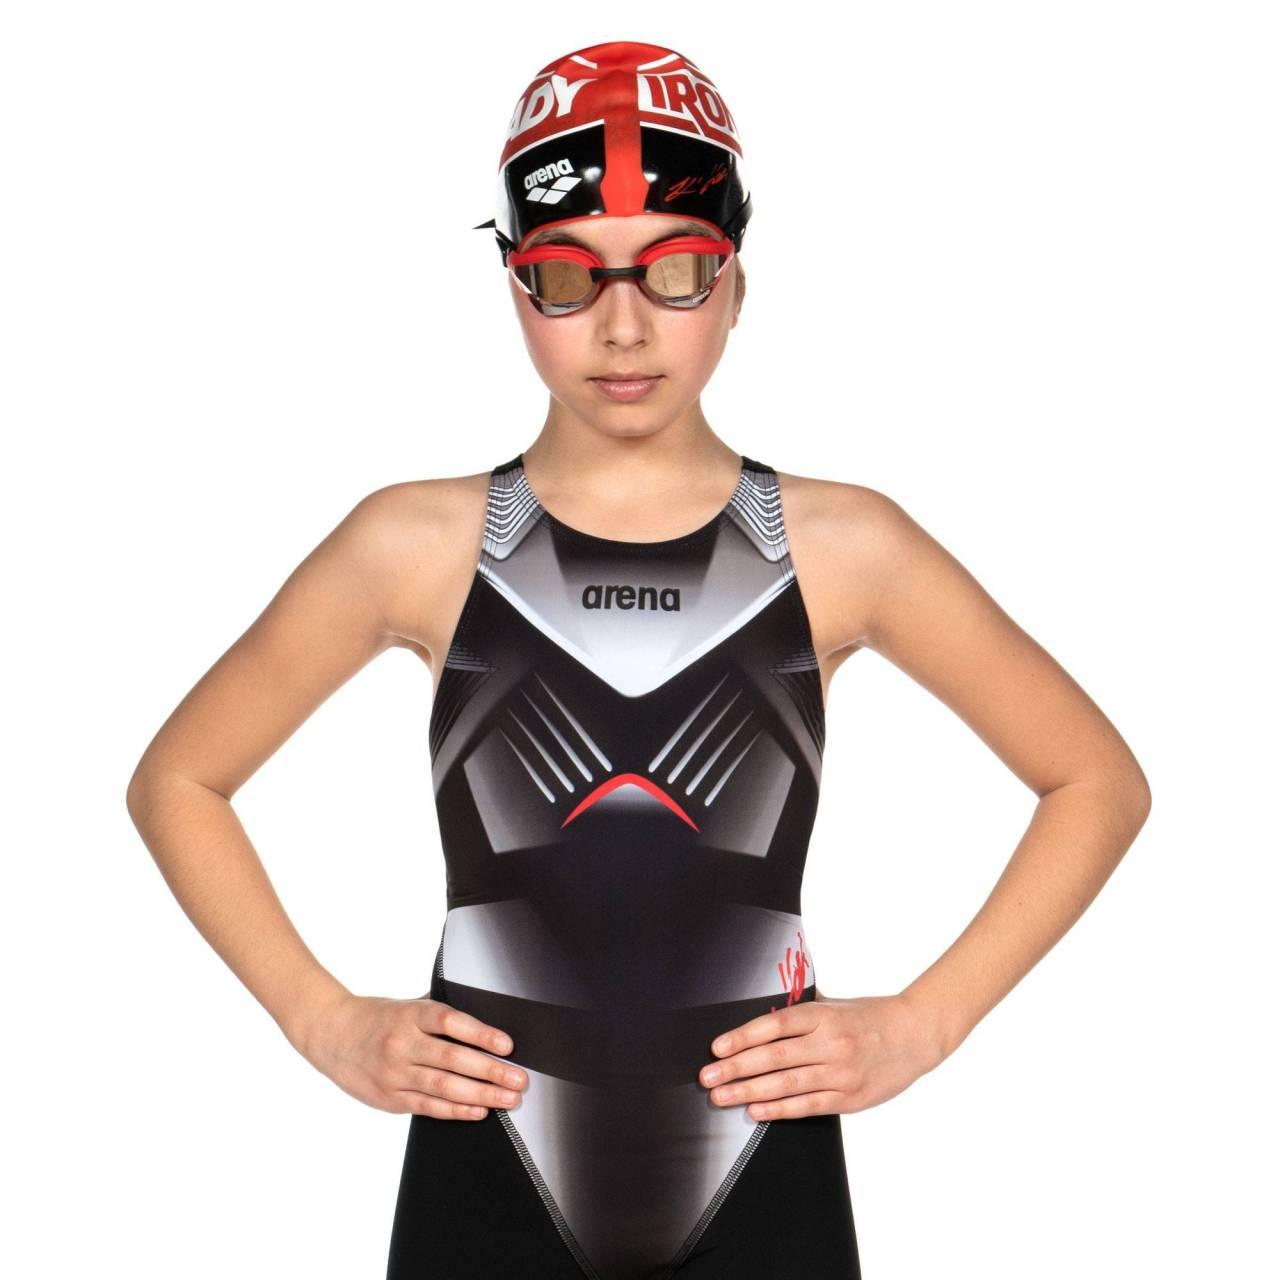 Powerskin ST 2.0 für Mädchen - Elite II Iron Lady Katinka Hosszu